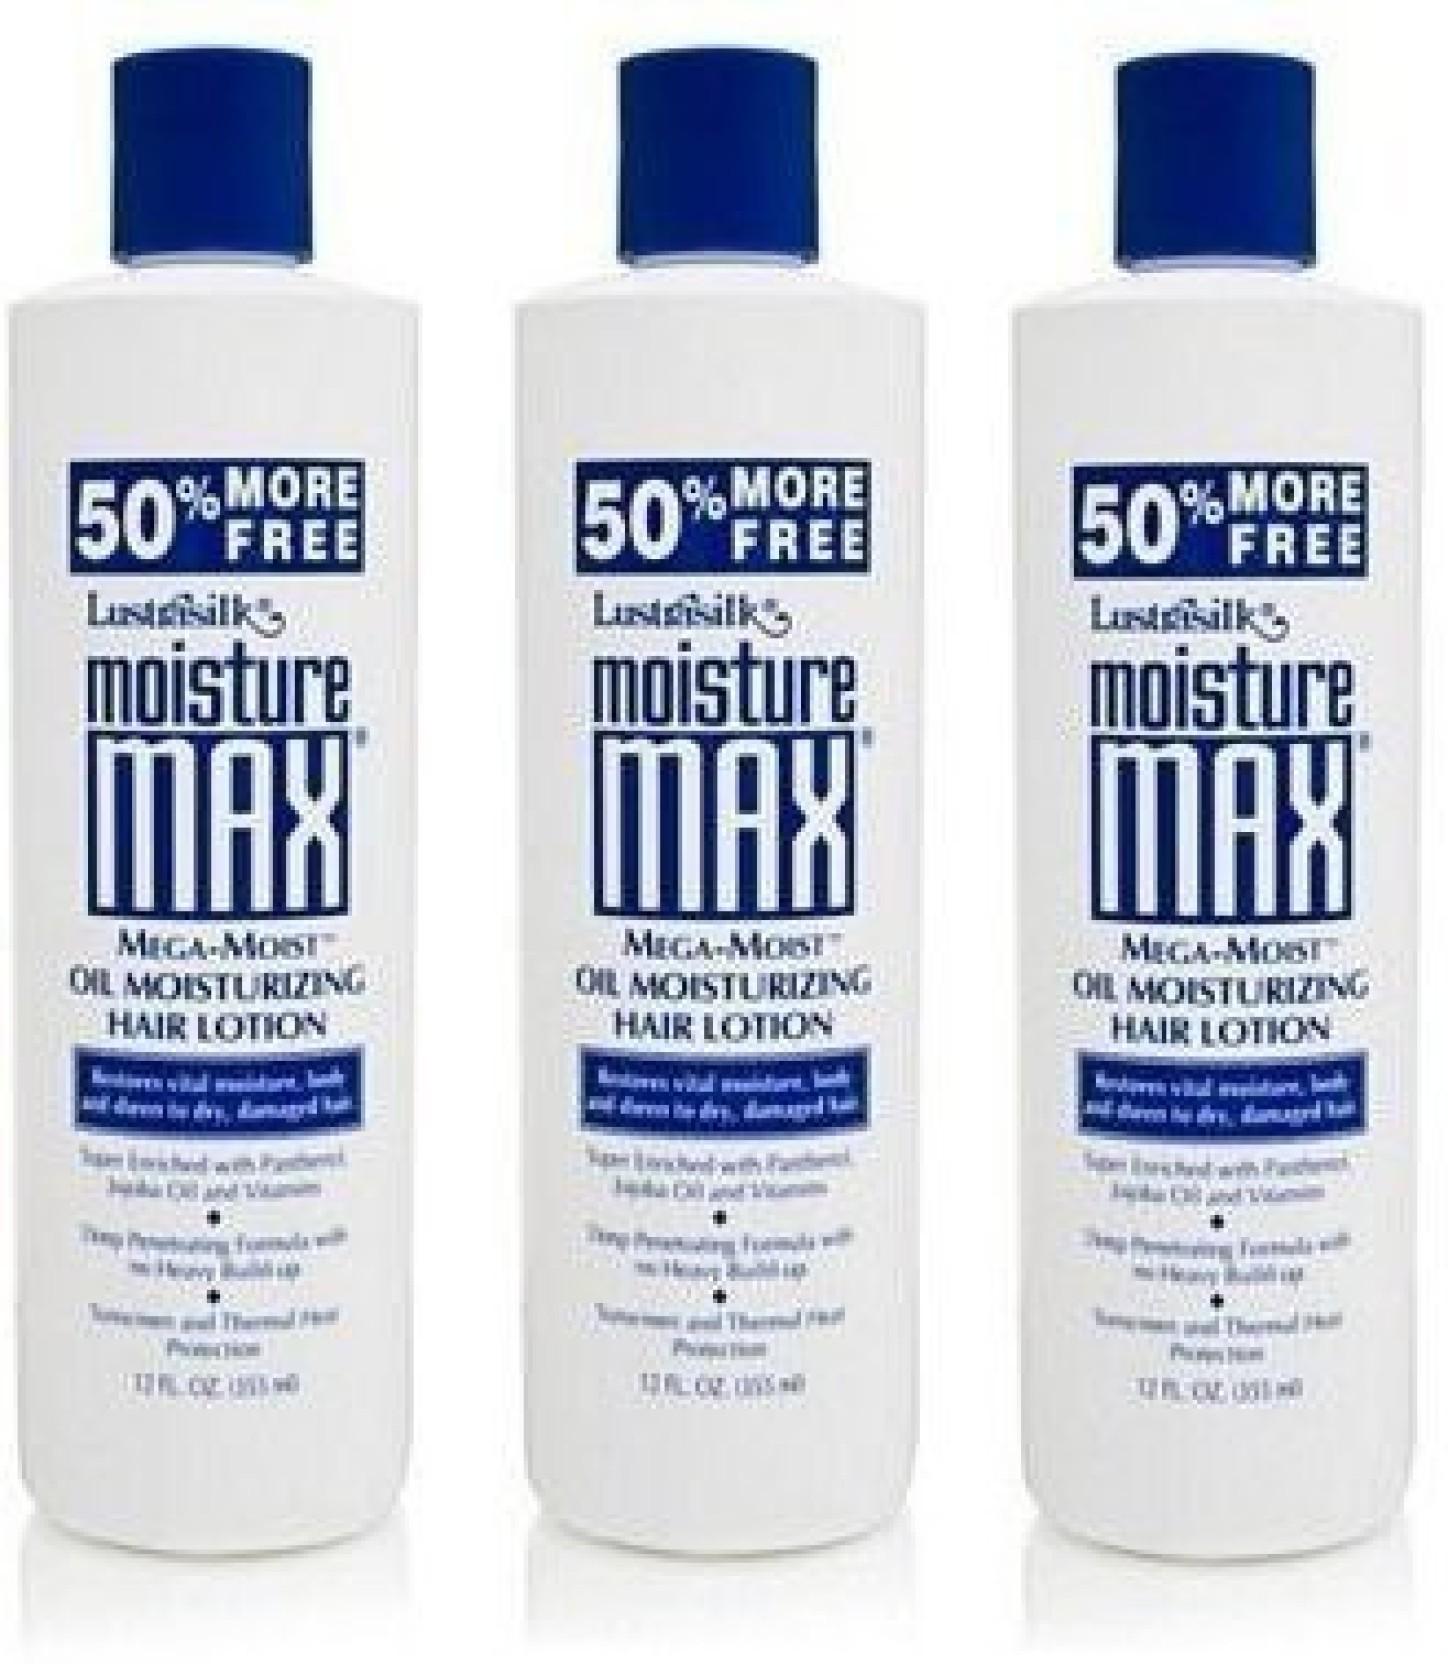 Lustrasilk Moisture Max Mega Moist Oil Moisturizing Hair Lotion 12 Original Sprout Ampamp Body Baby Wash 975 Ml Share